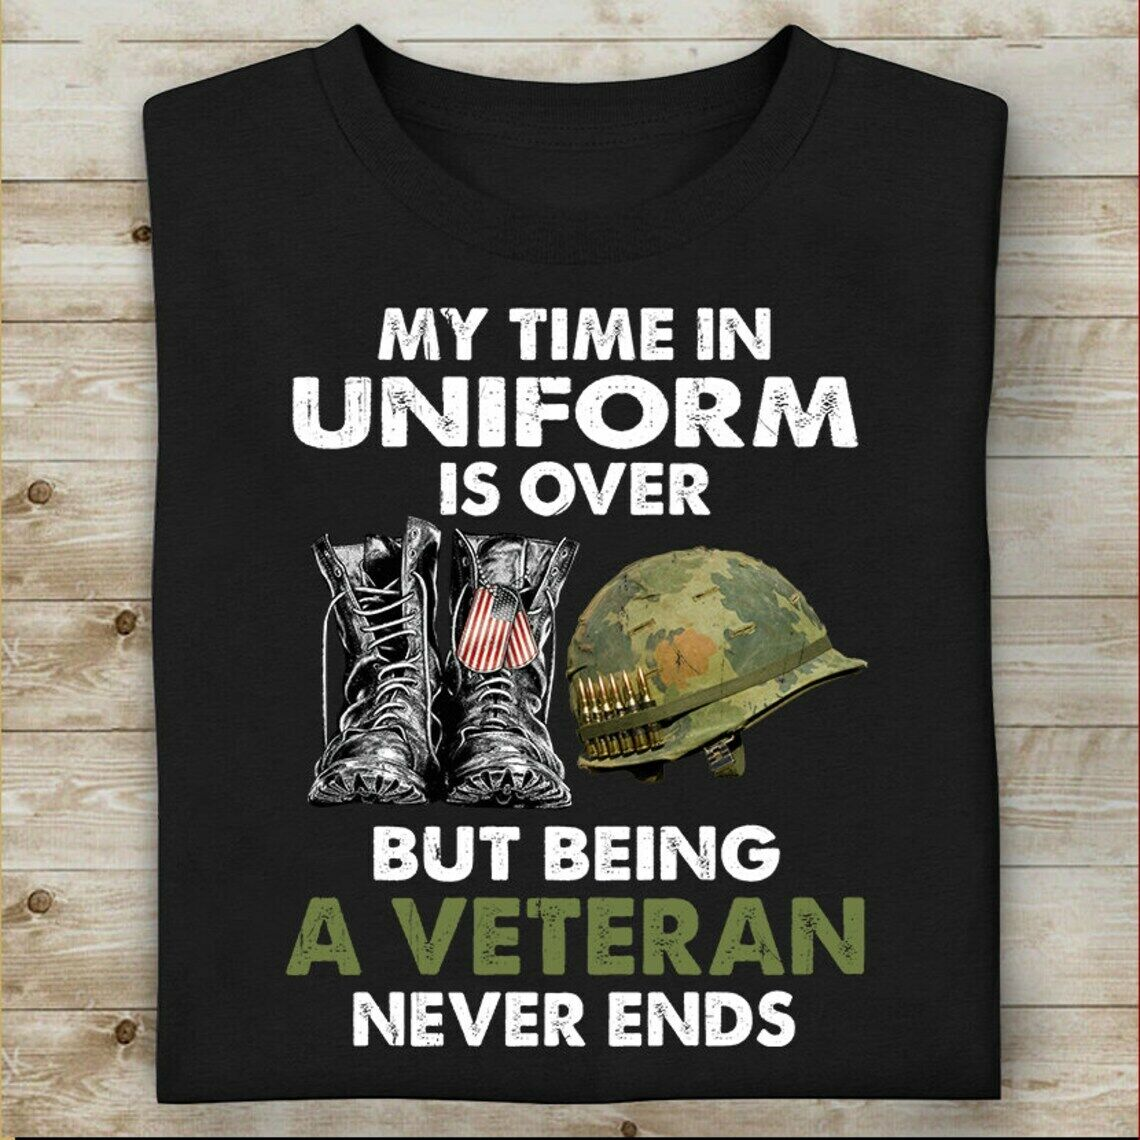 Veteran T-Shirt Memorial Day Soldier Army Military Us Flag Retro Shirt Masswerks Store